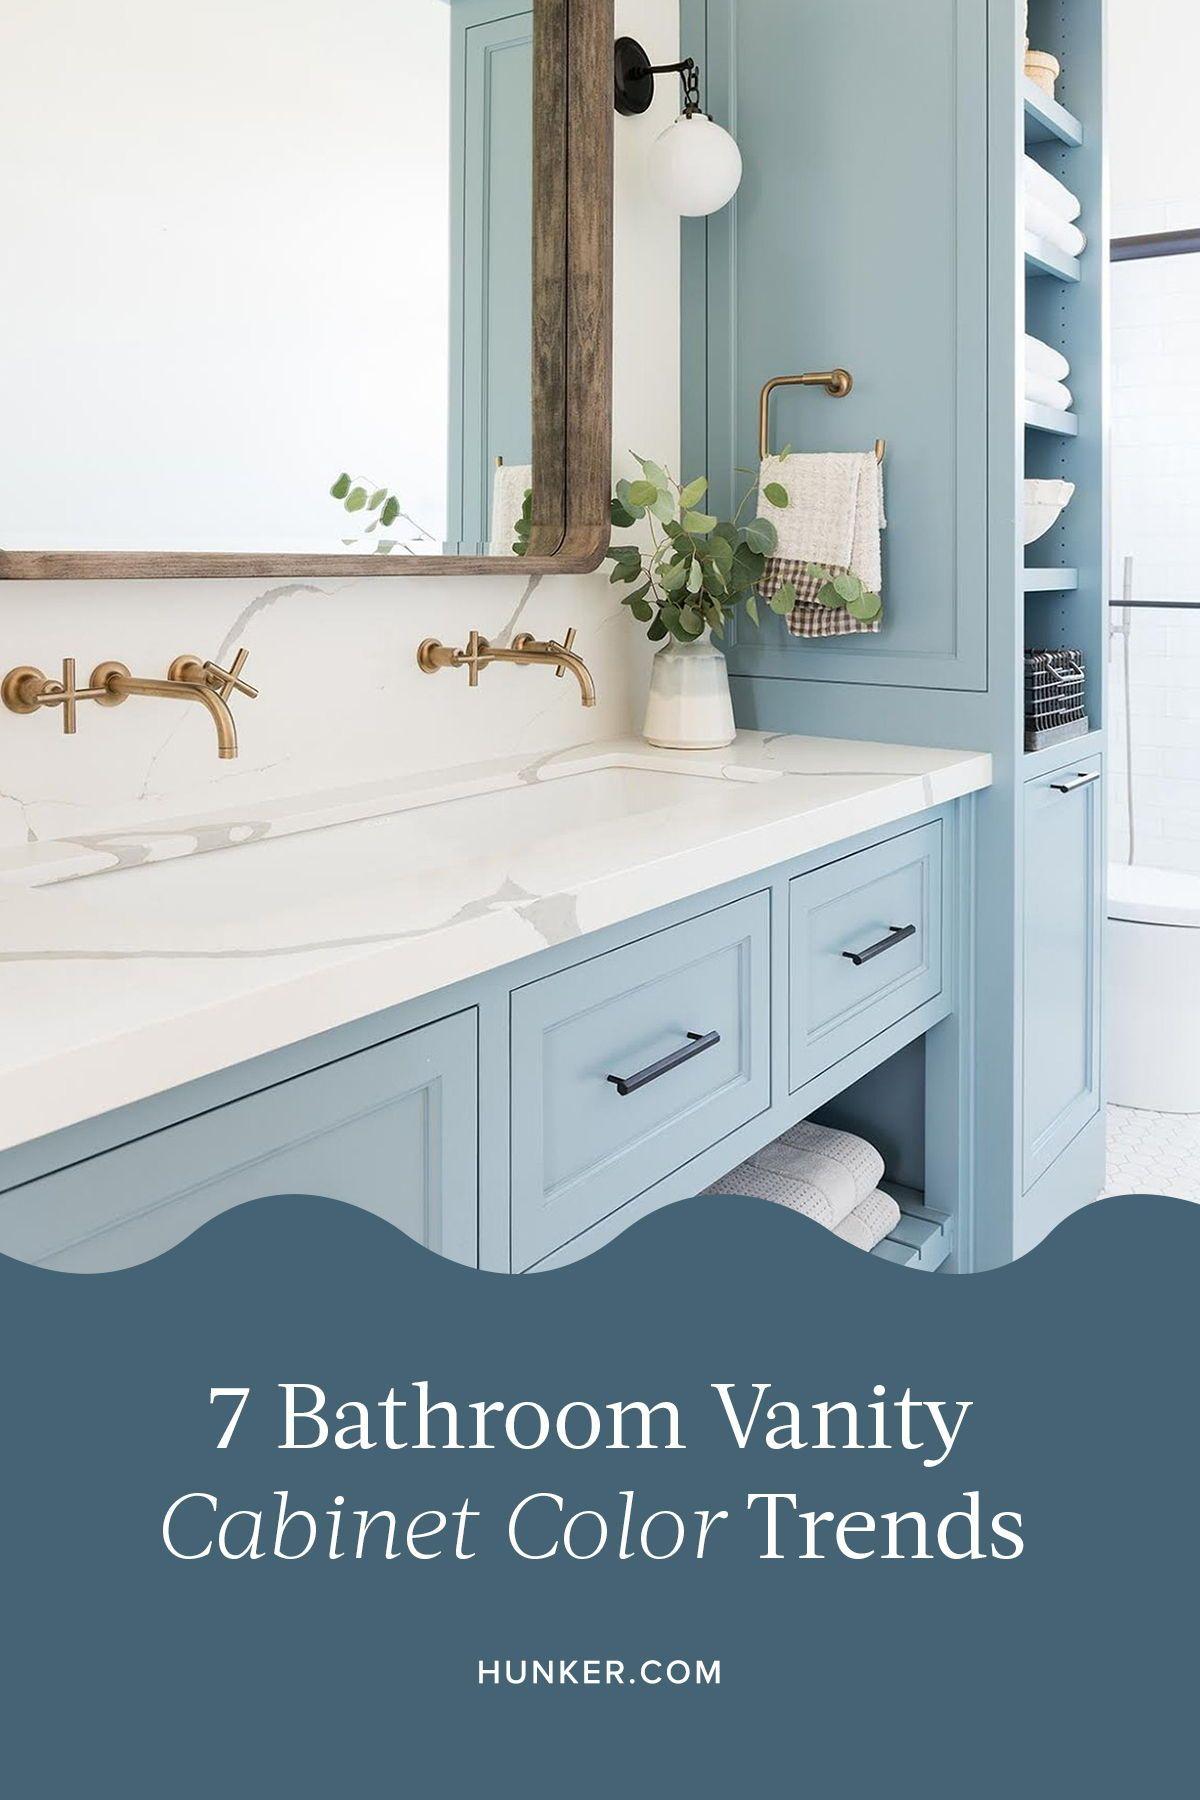 7 Bathroom Vanity Cabinet Colors You Ll See Everywhere In 2020 Hunker Bathroom Vanity Cabinets Cabinet Colors Bathroom Cabinet Colors